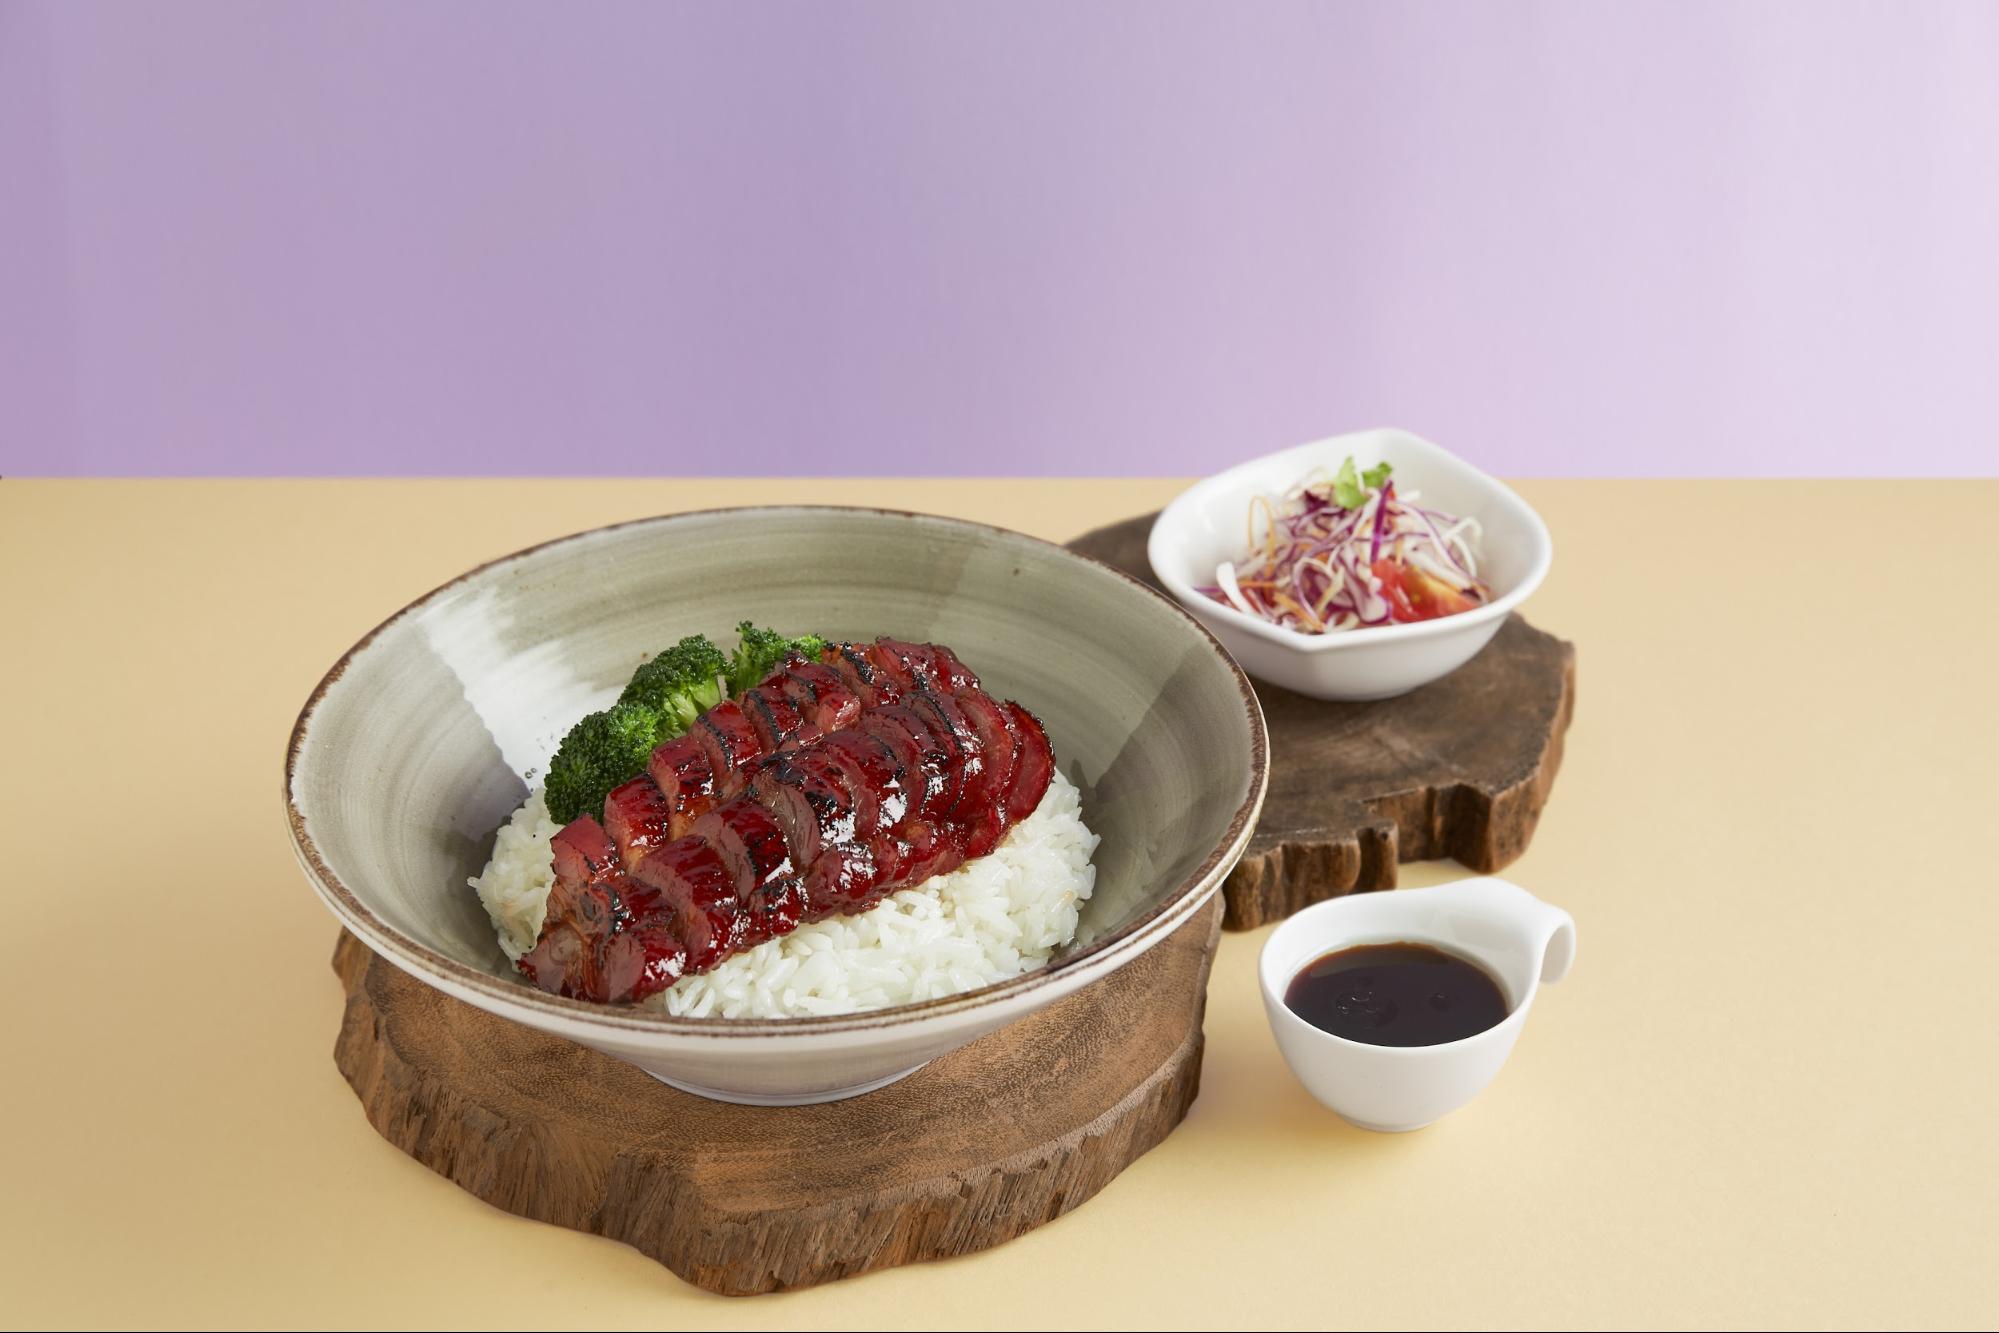 1-for-1 dining deals - Crystal Jade GO